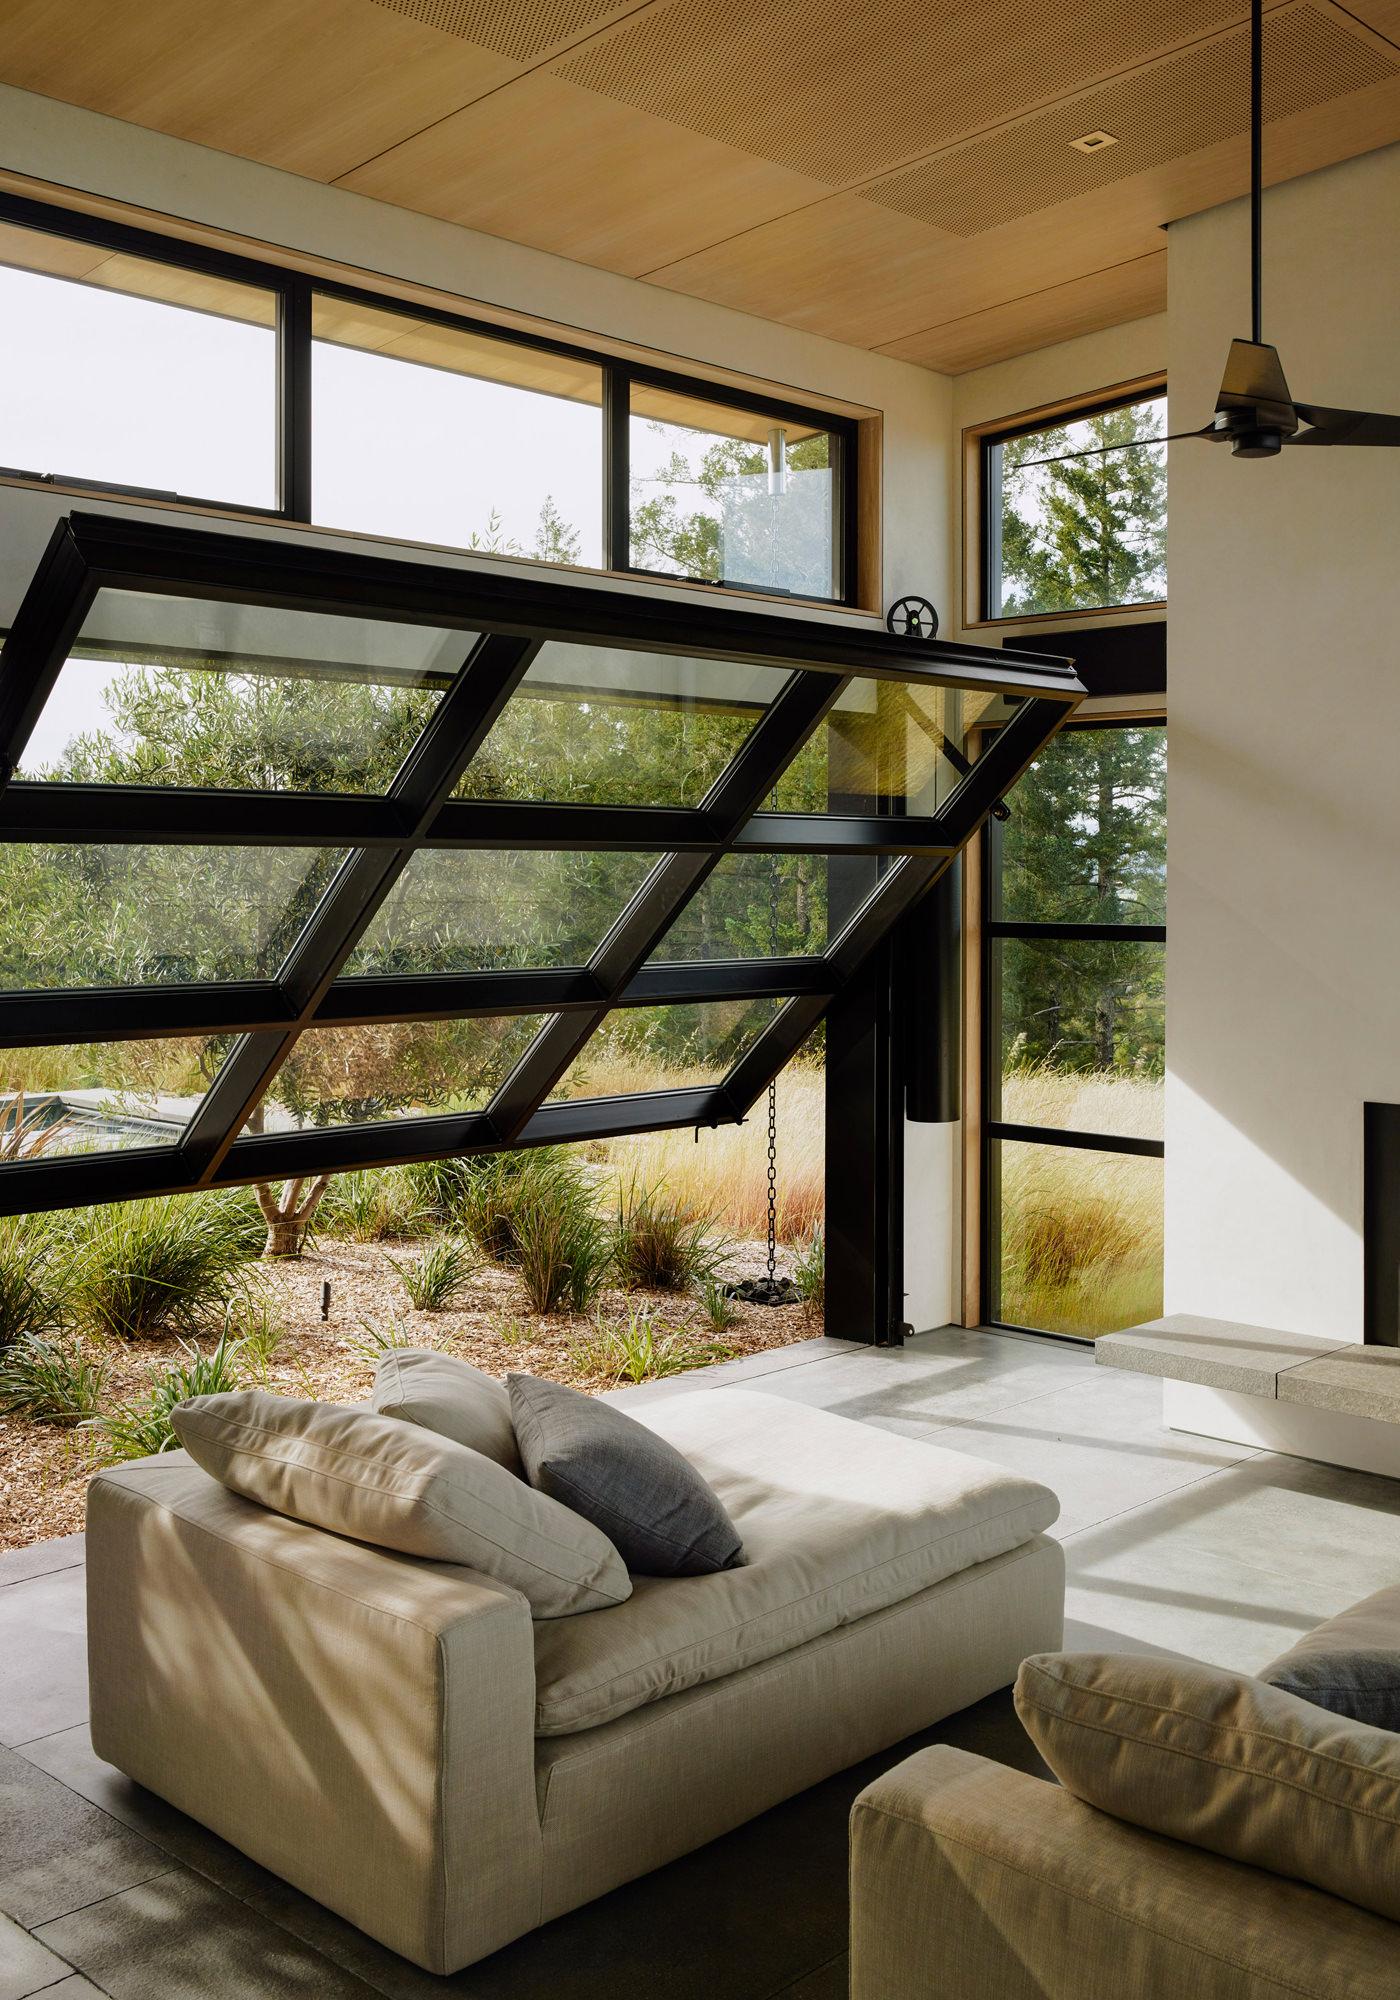 Healdsburg House Sonoma Californie Architecture Salon Fenêtres Pivotantes